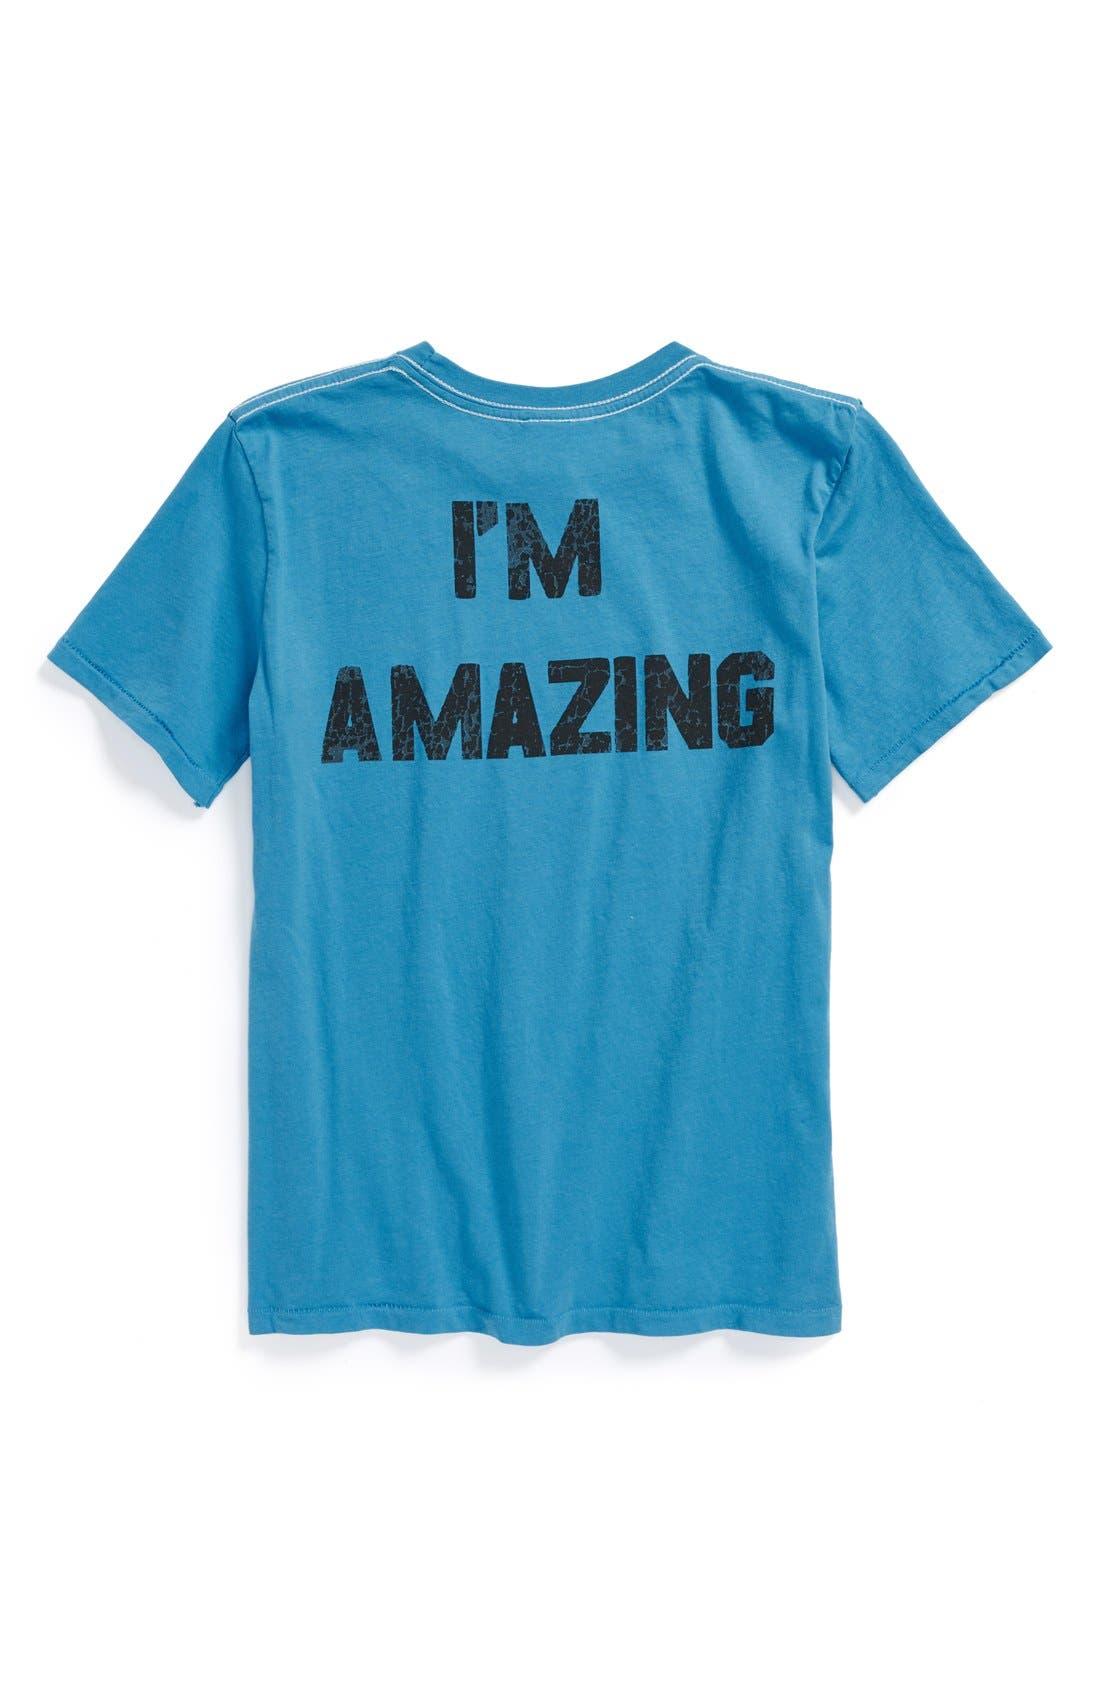 Alternate Image 2  - Junk Food 'I'm Amazing' T-Shirt (Little Boys)